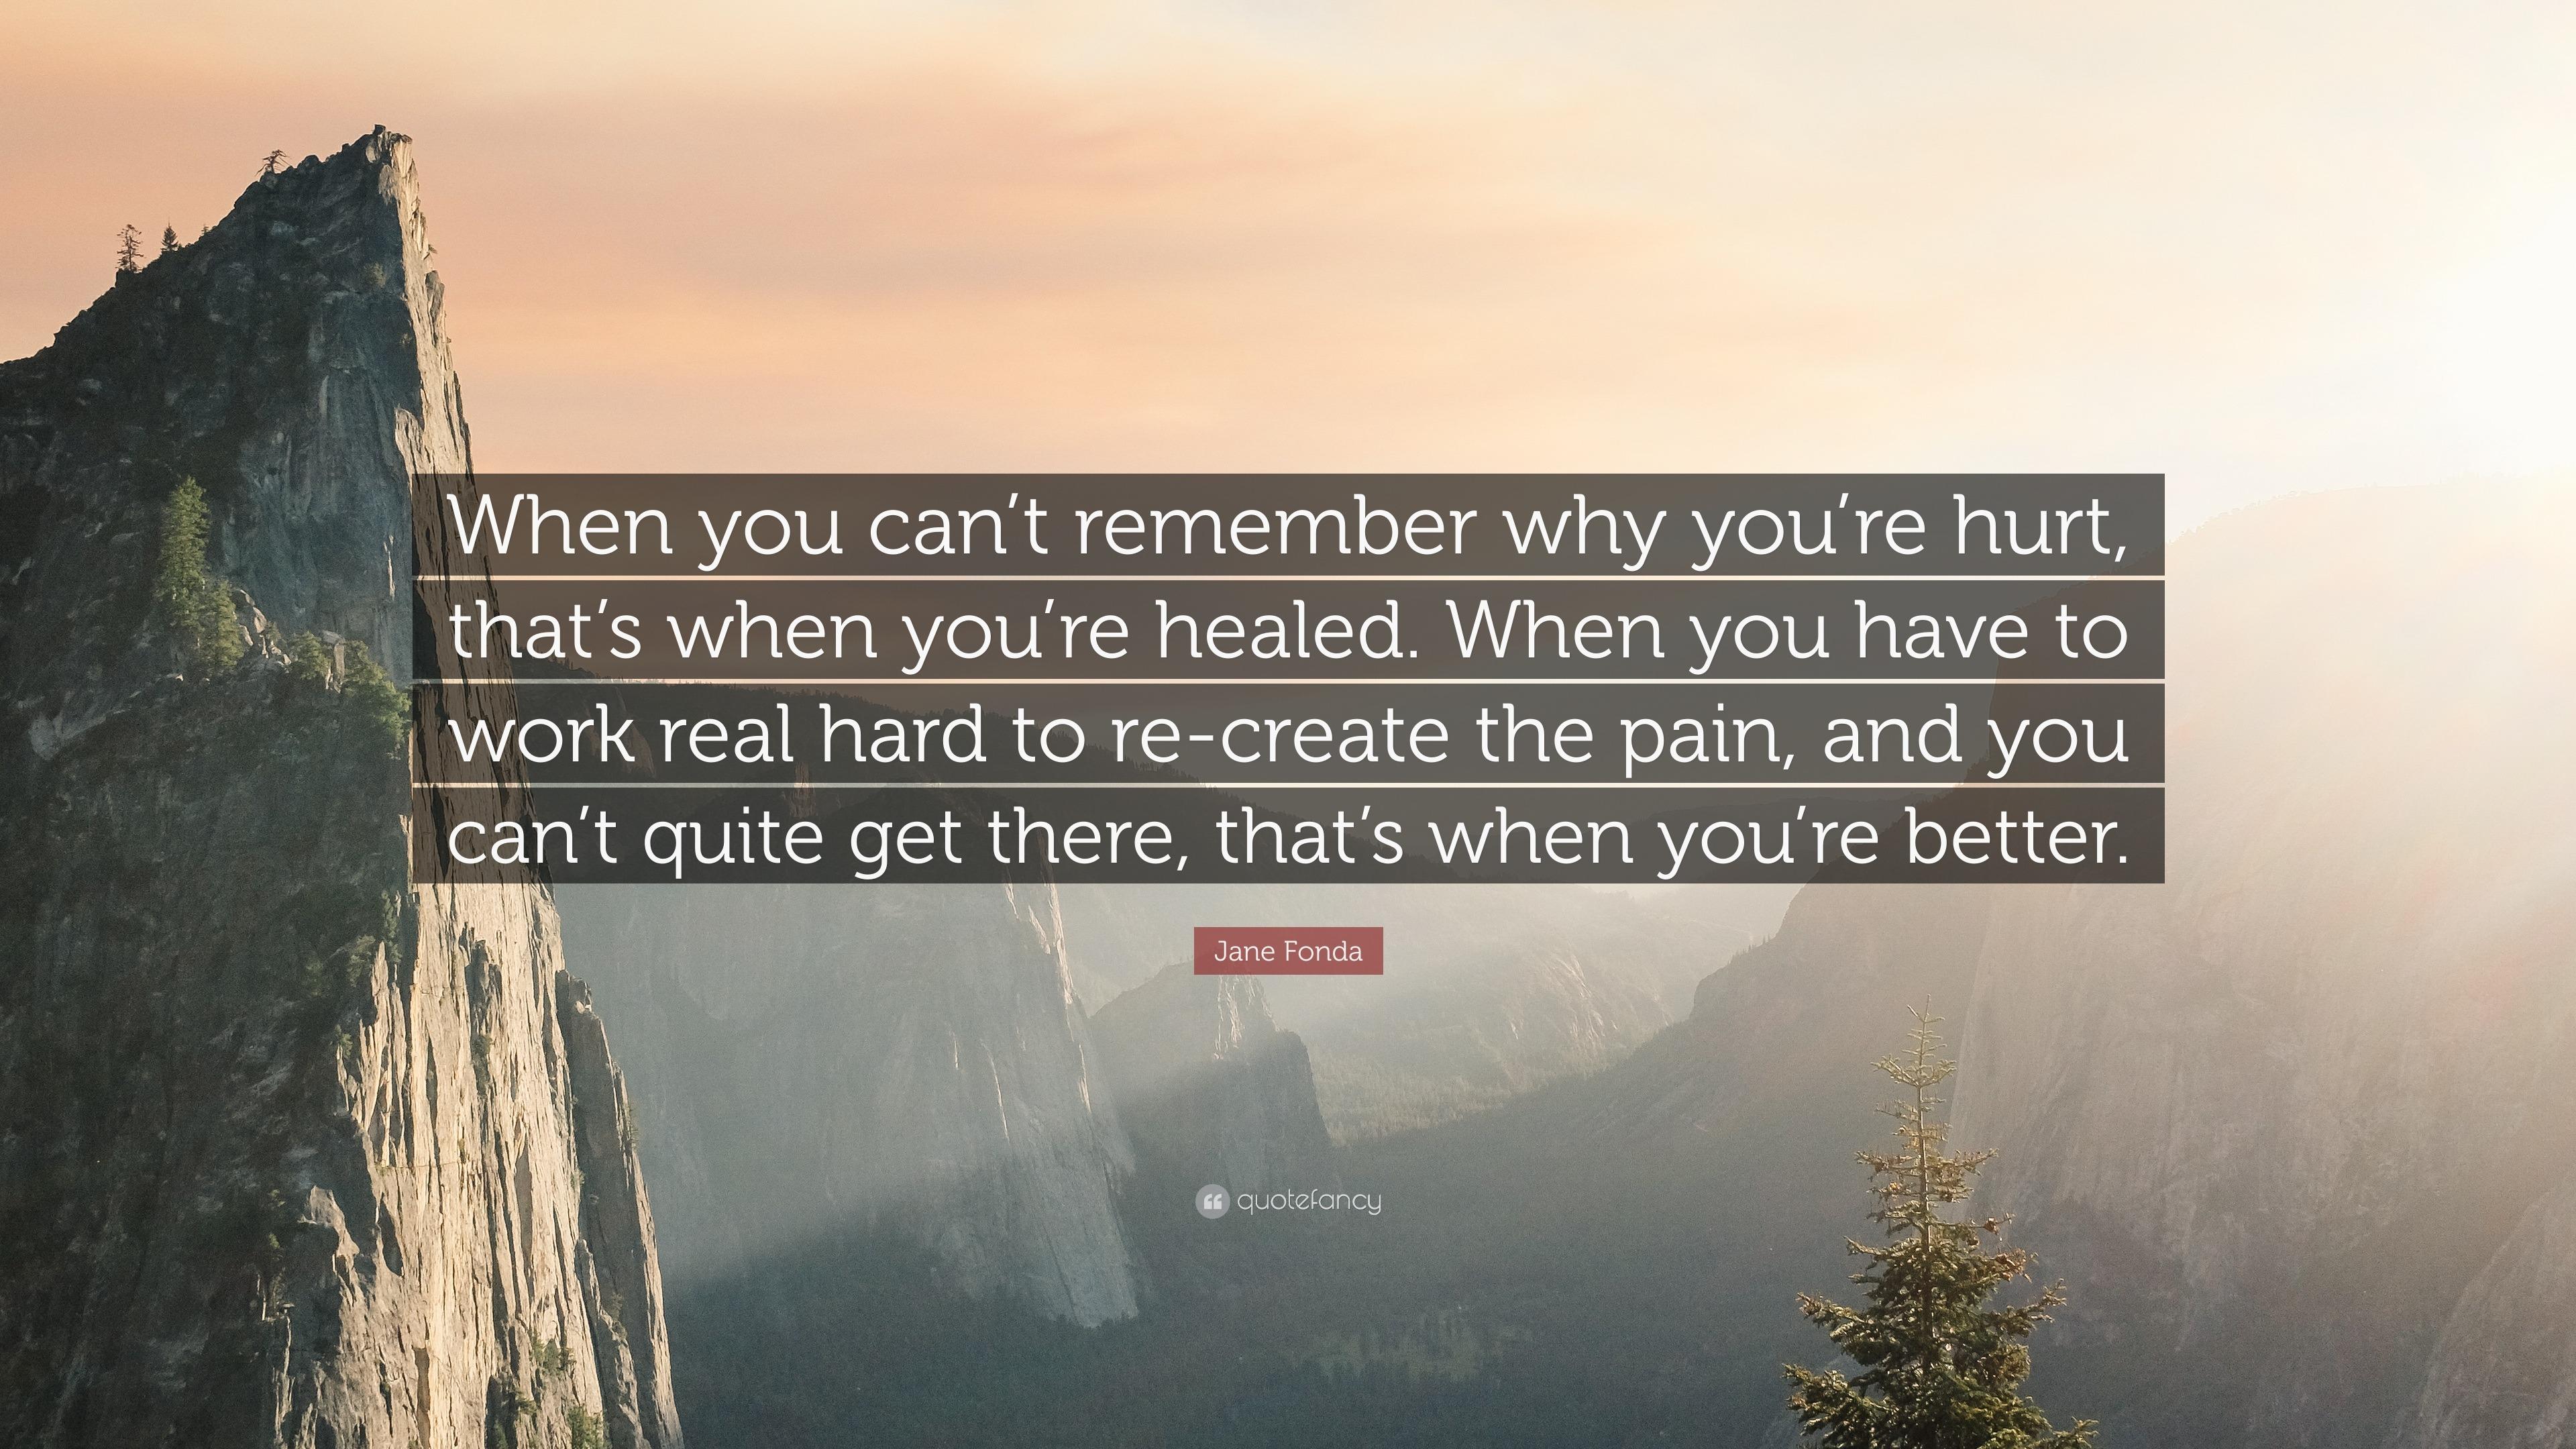 Attractive Jane Fonda Quote: U201cWhen You Canu0027t Remember Why Youu0027re Hurt